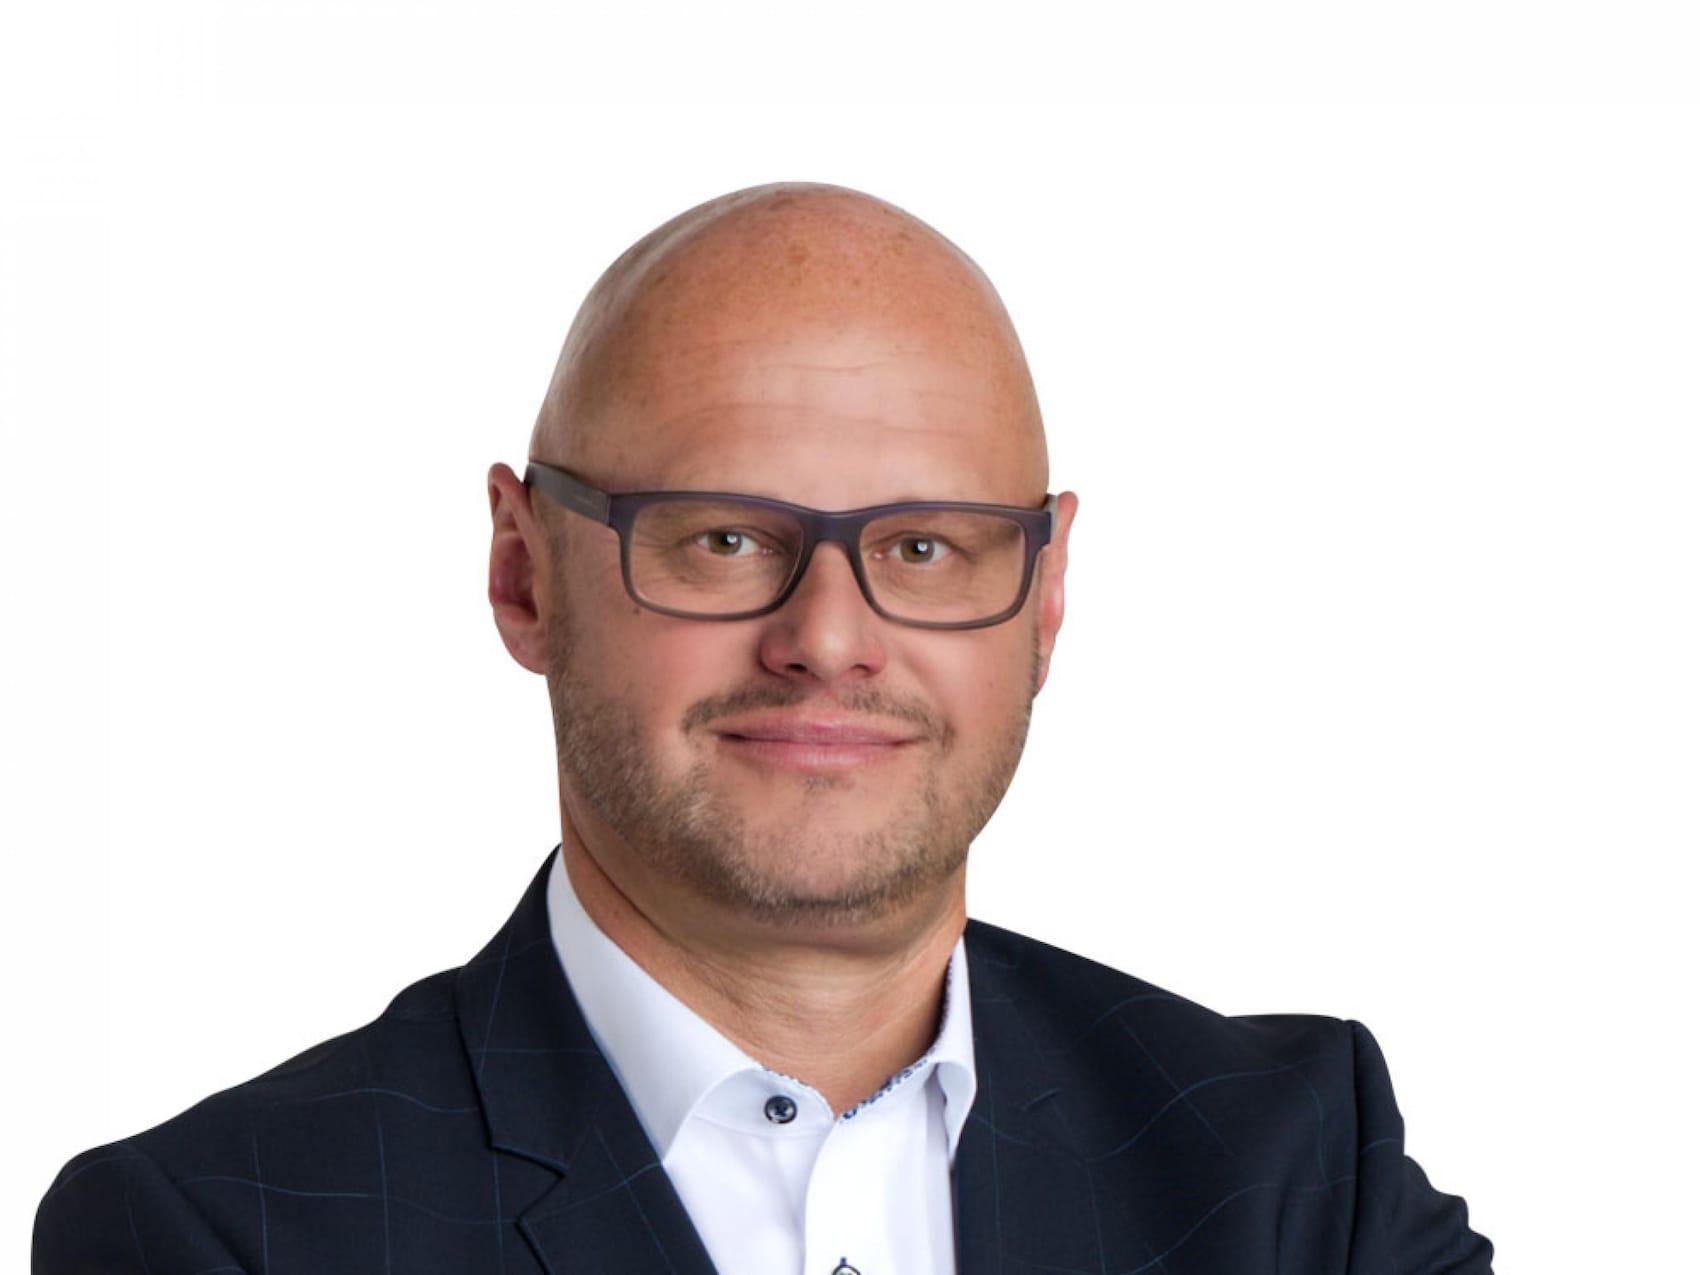 Foto Hans Joachim Jäger